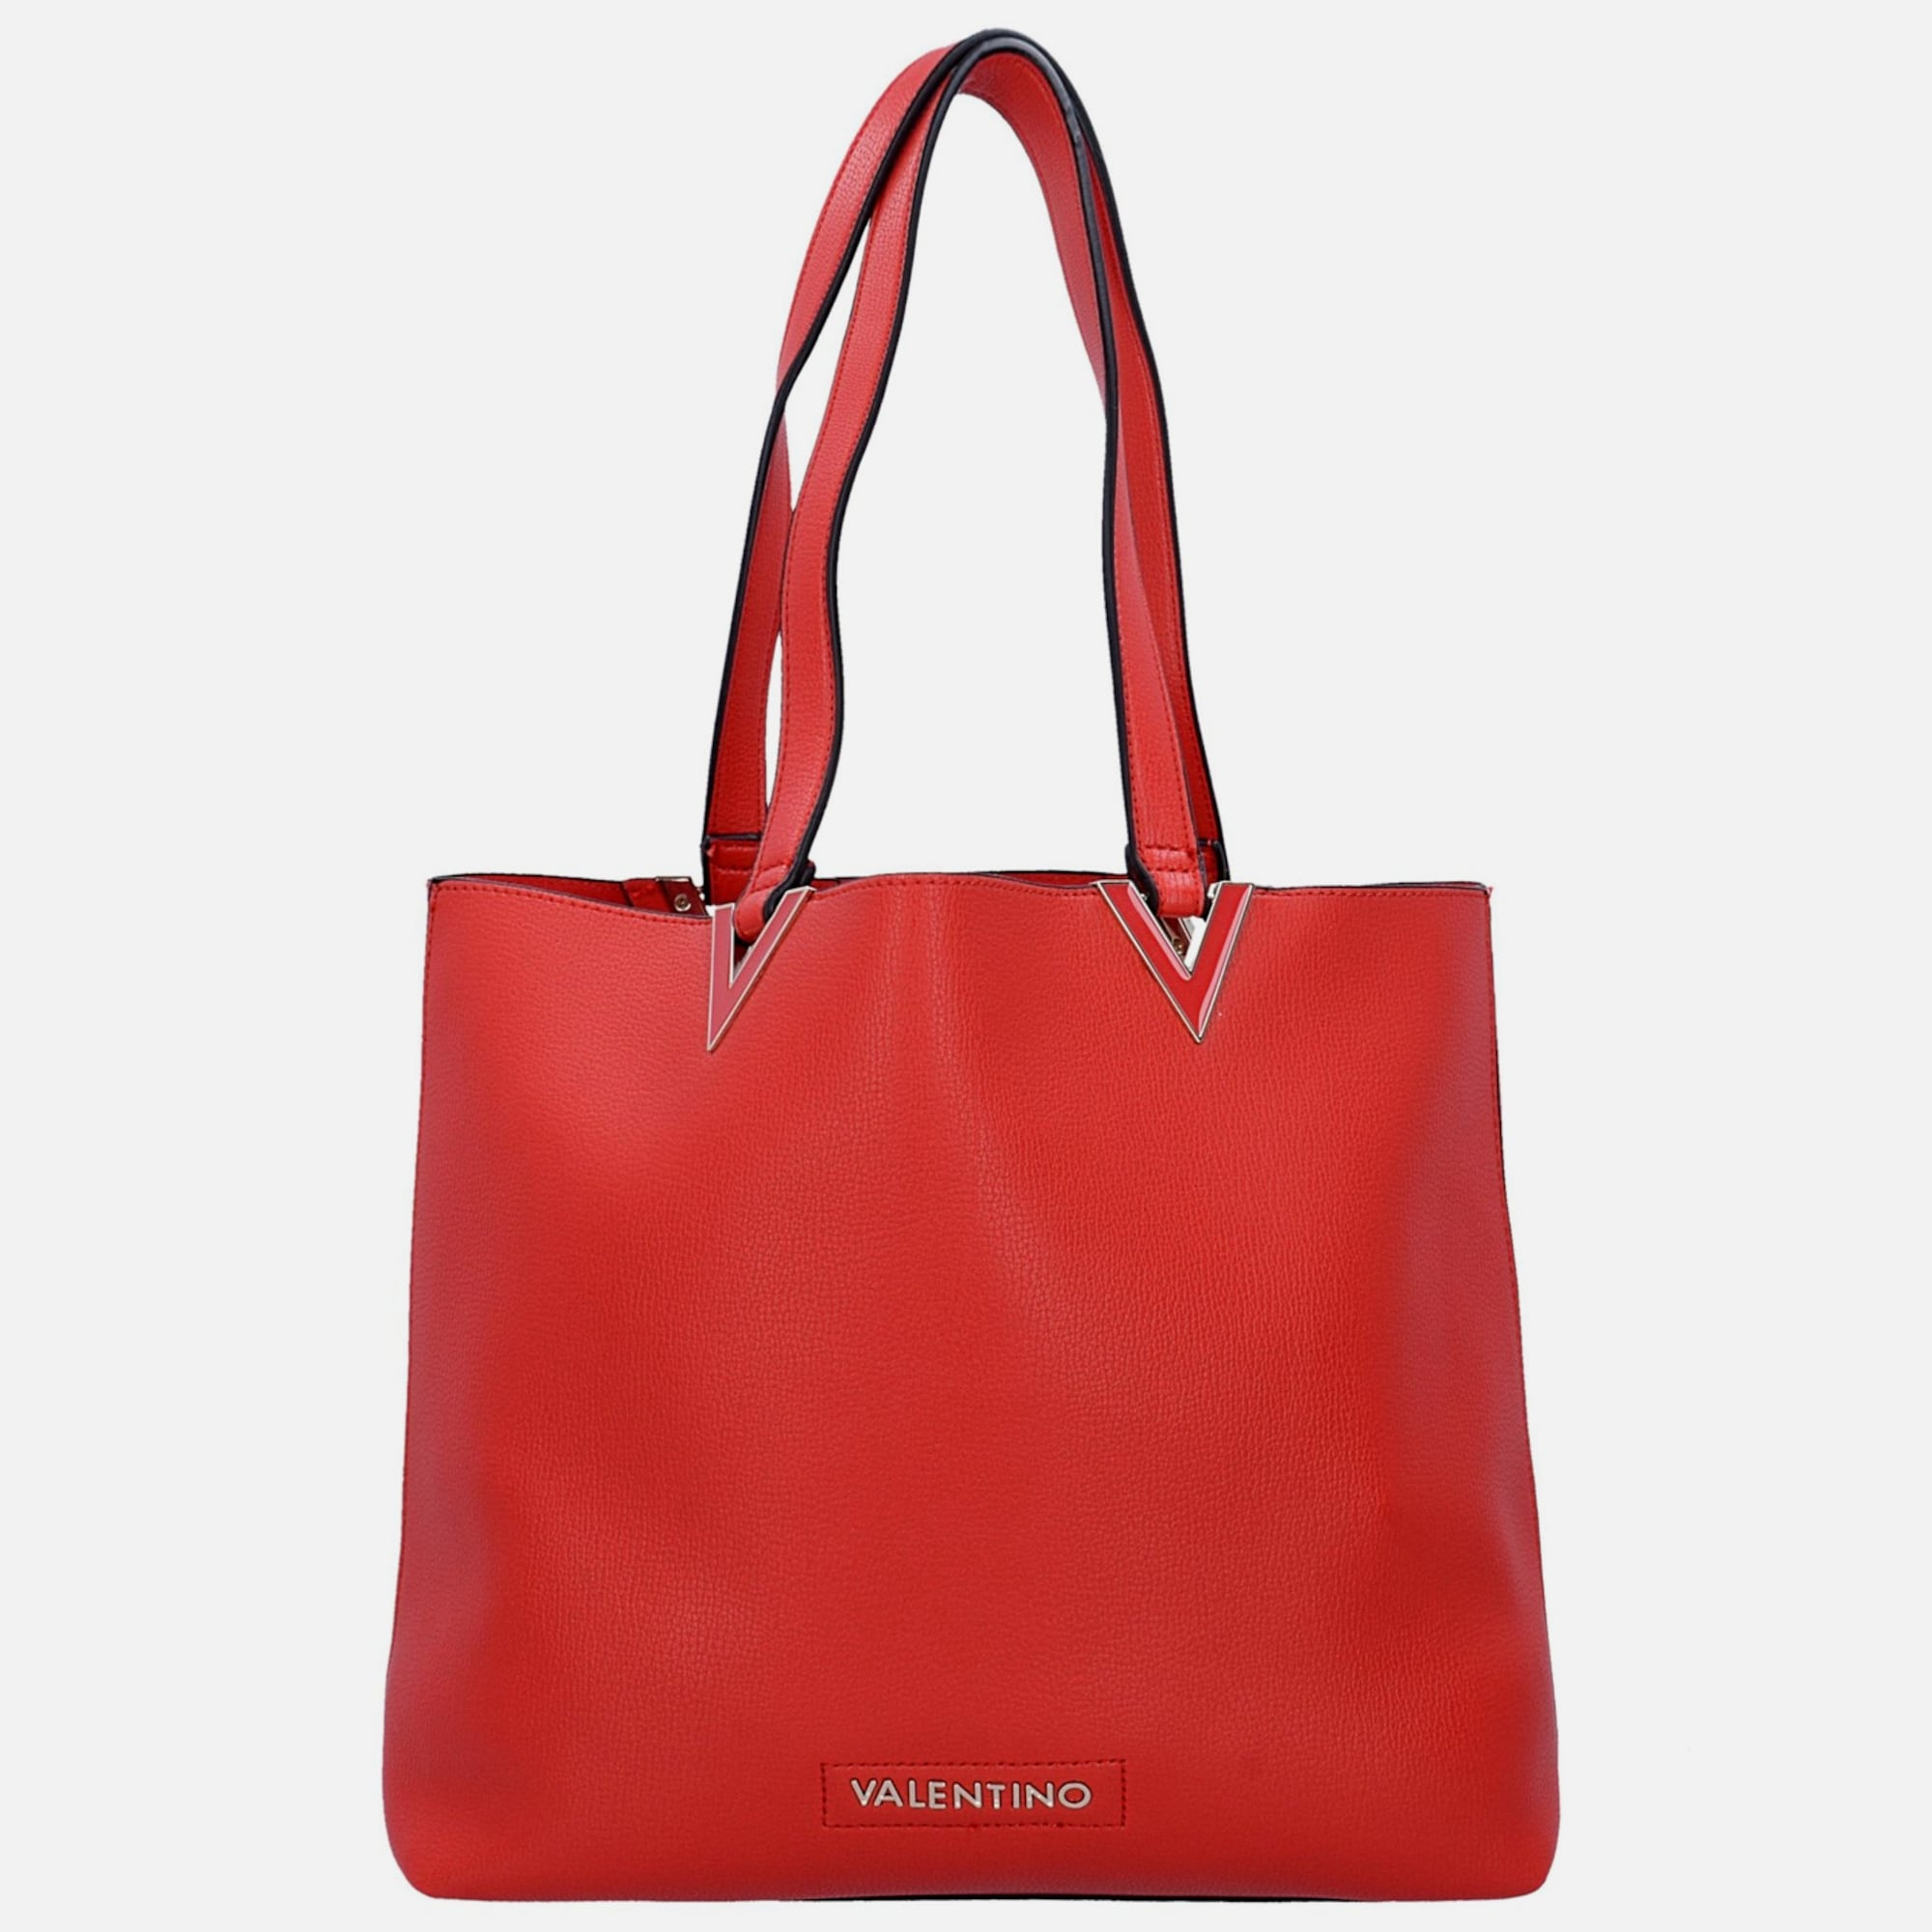 valentino handbags calendula shopper tasche 34 cm in rot. Black Bedroom Furniture Sets. Home Design Ideas